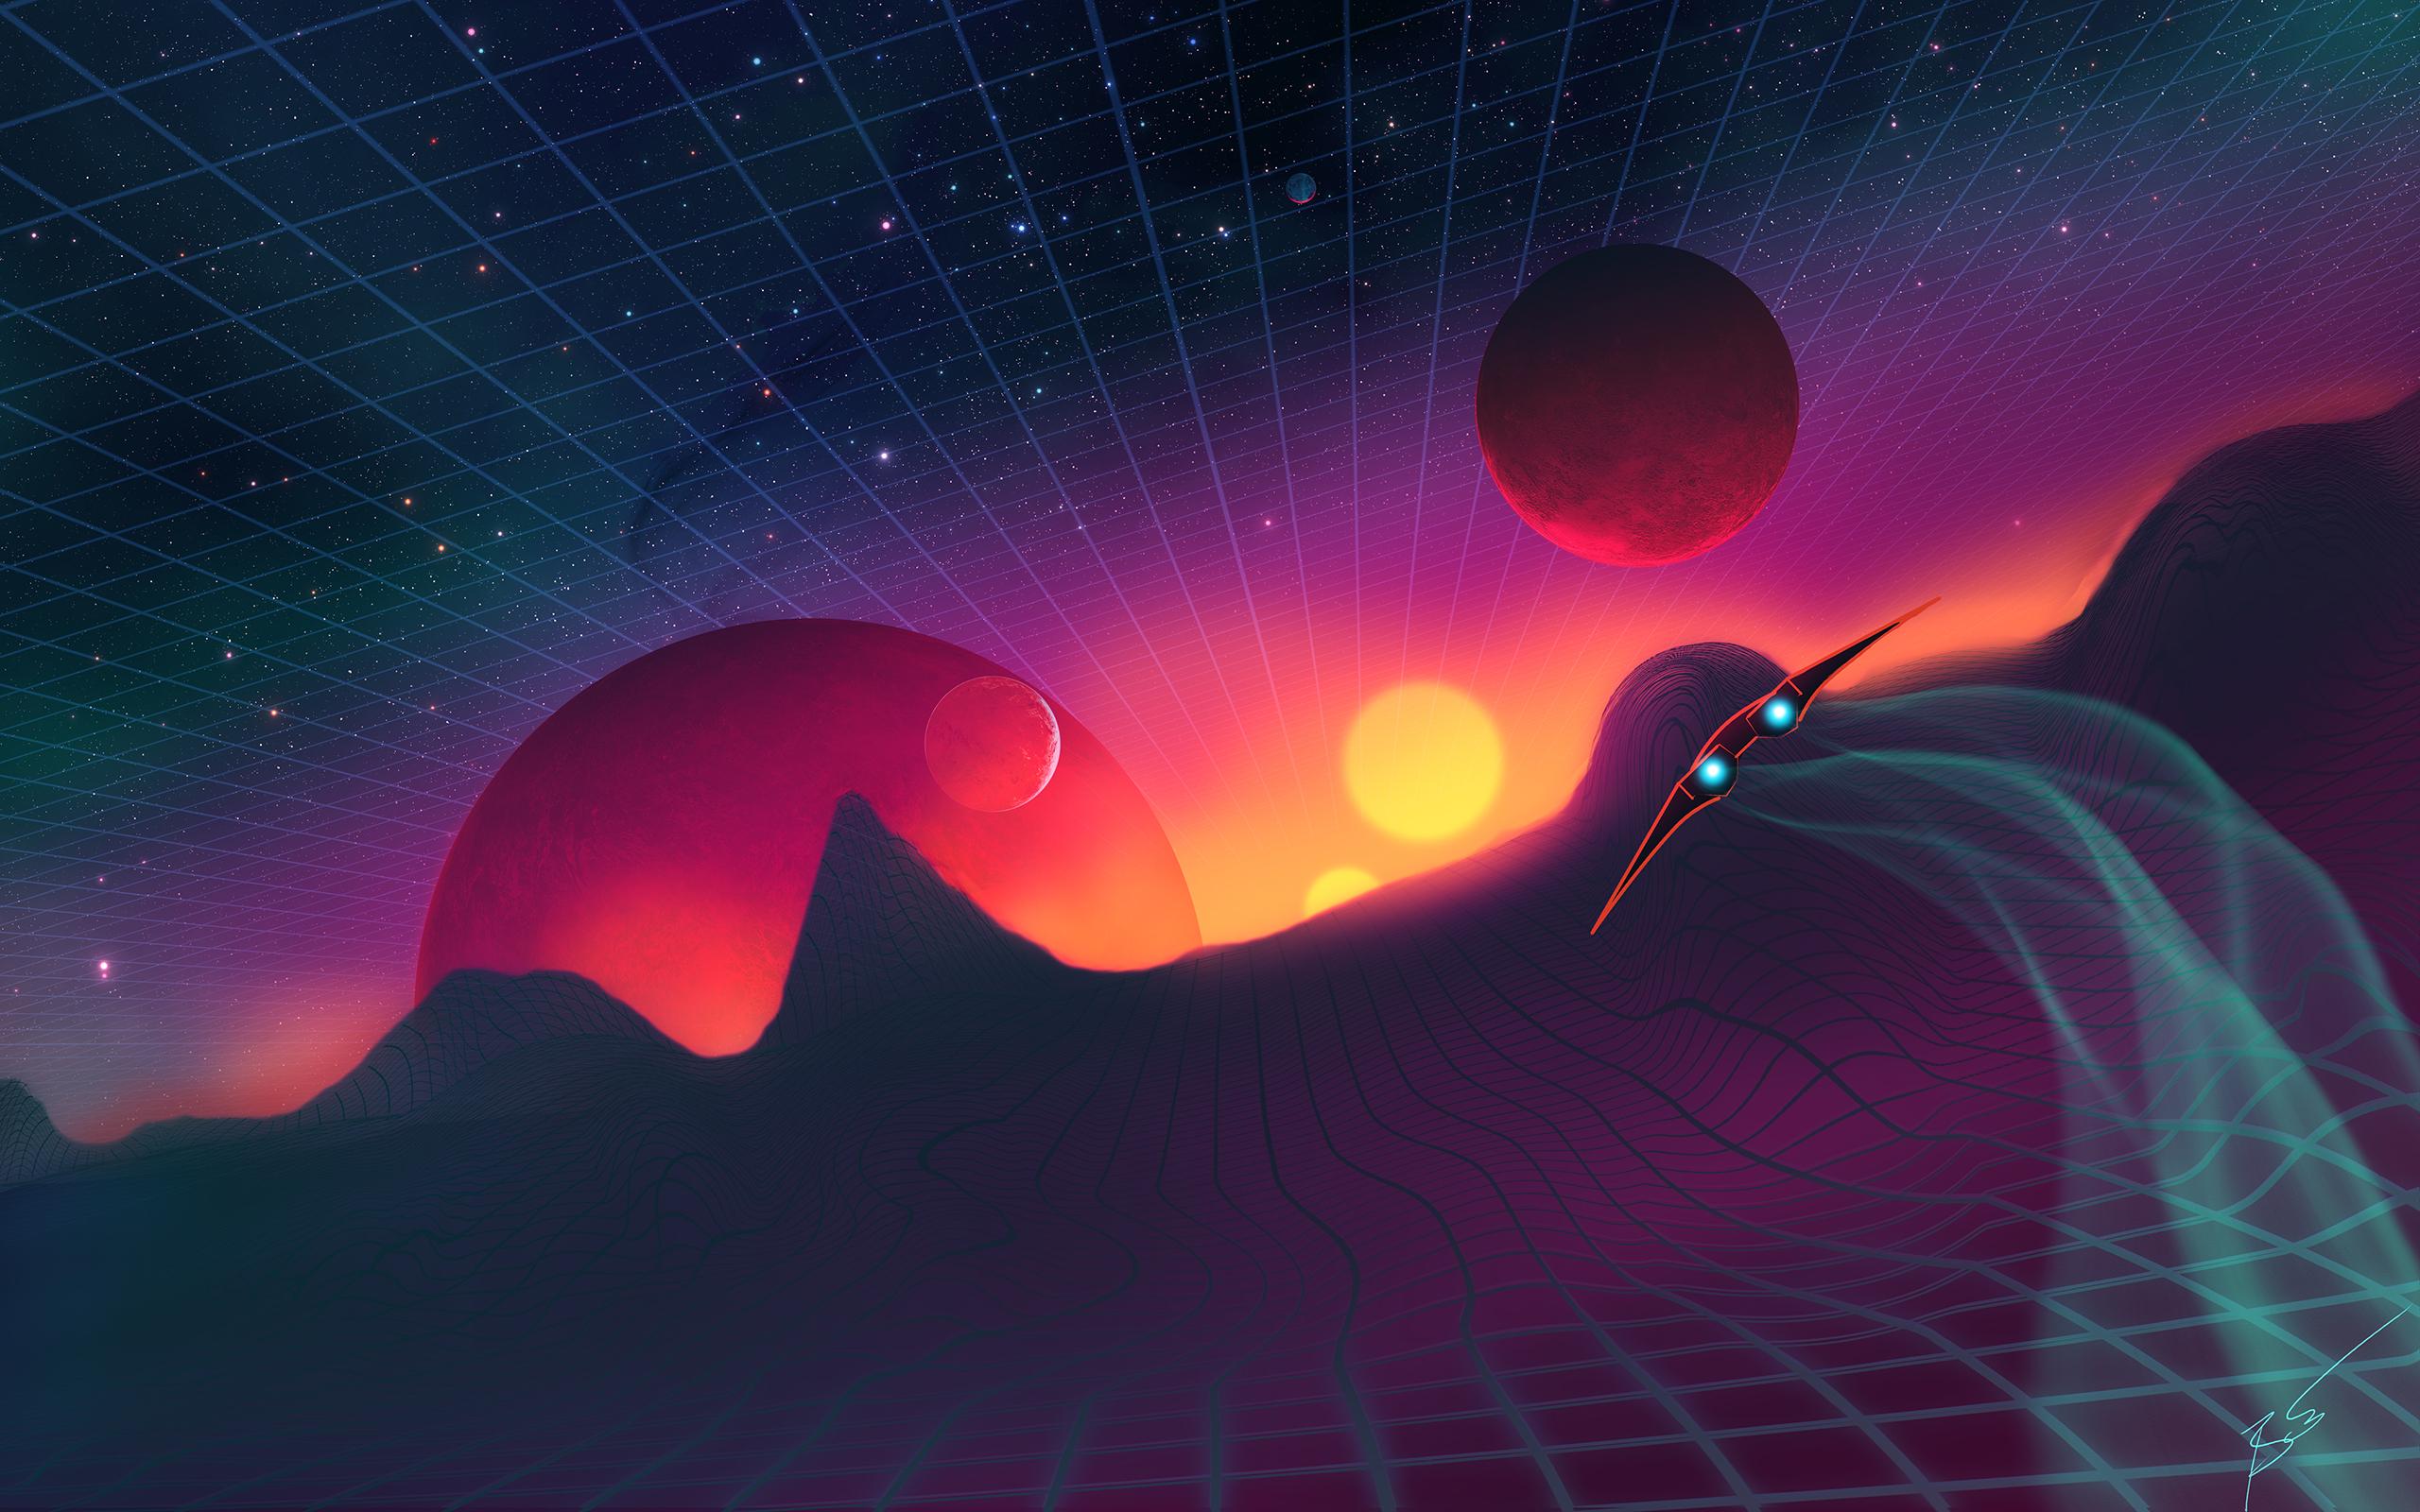 retro-space-art-5j.jpg